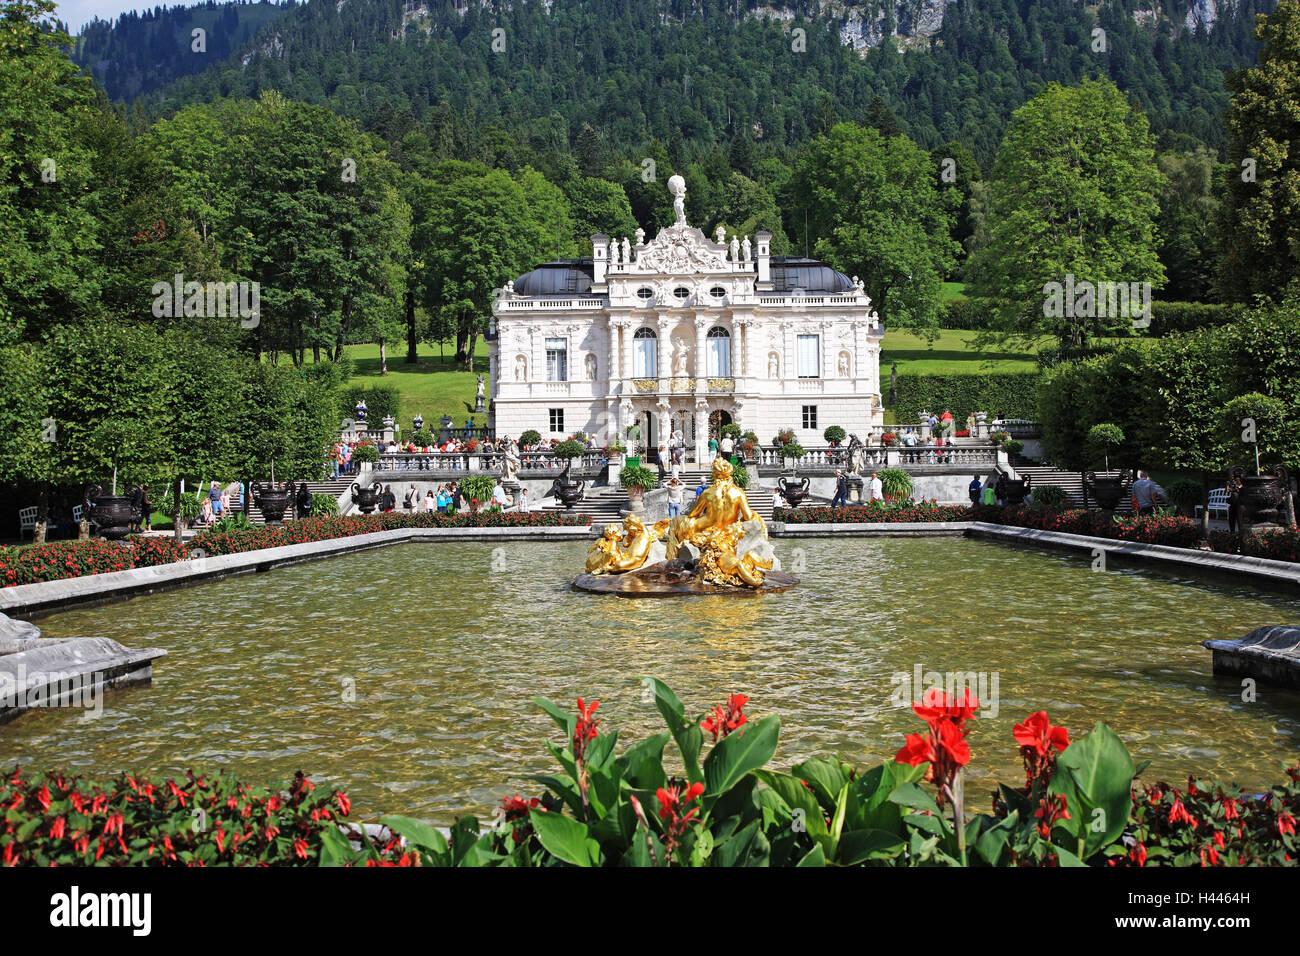 Germany, Bavaria, castle gentle court, park, tourist, - Stock Image